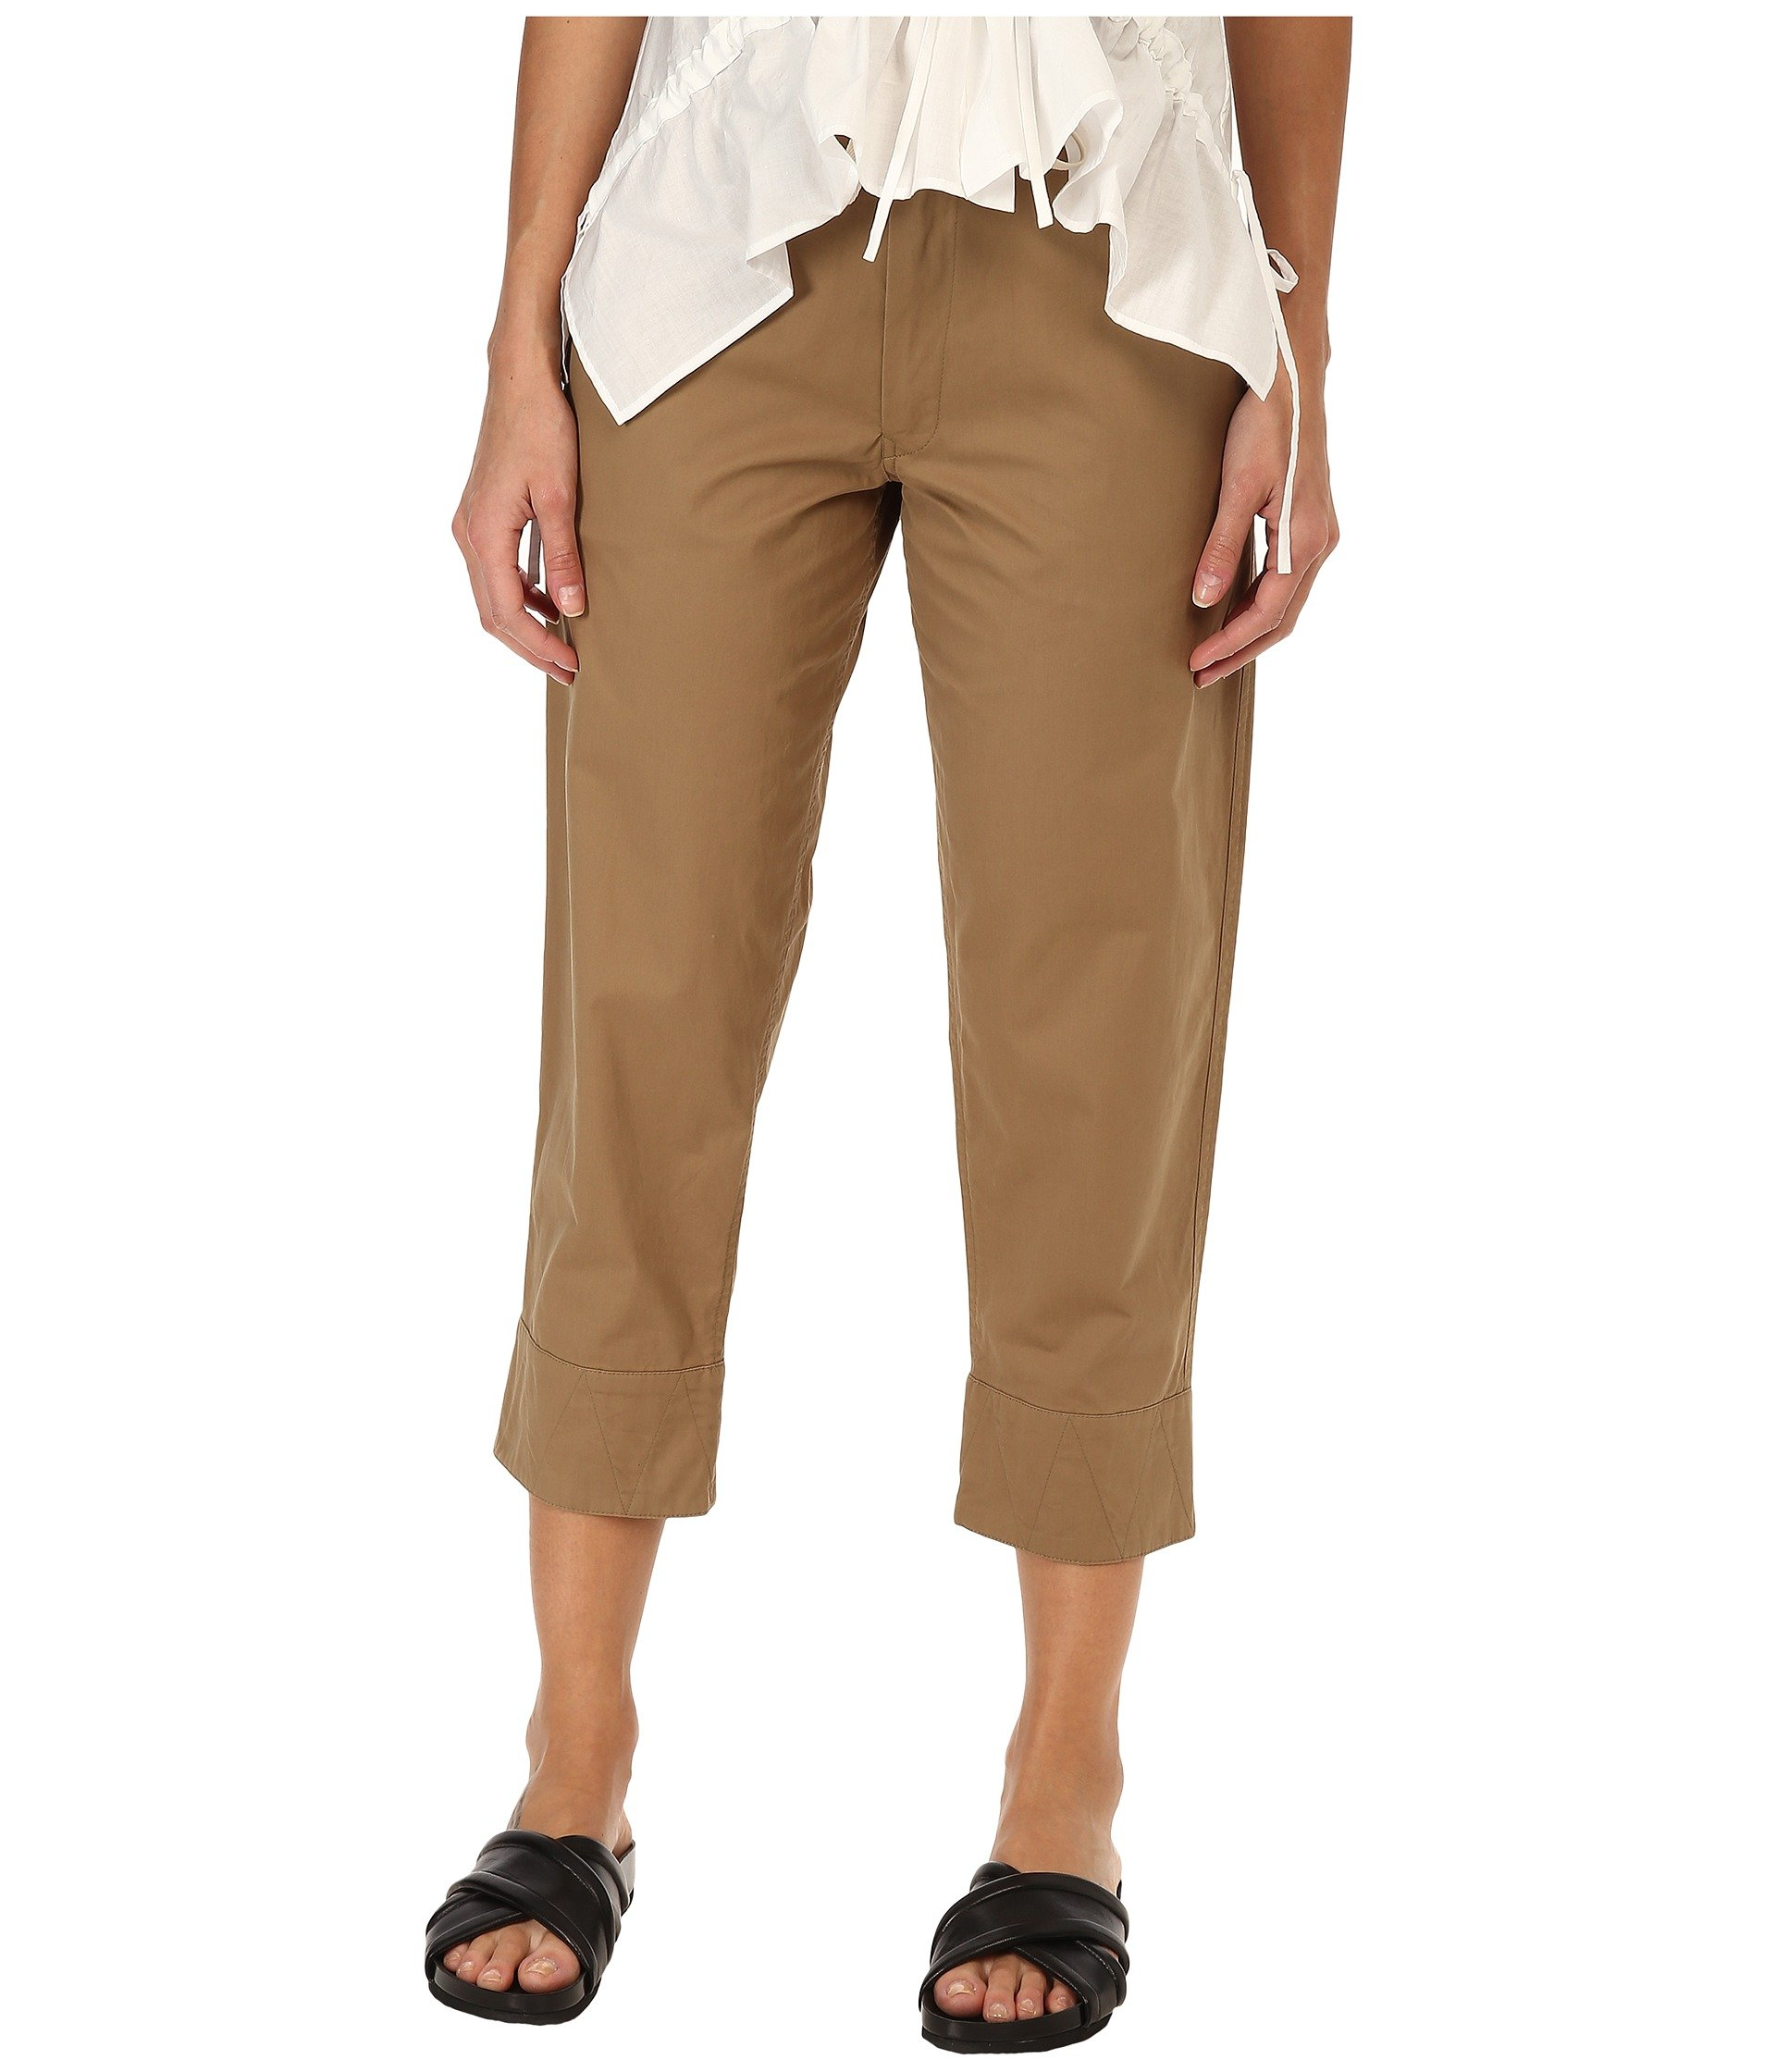 Pantalón para Mujer Yand#39;s by Yohji Yamamoto Medium China Pants  +